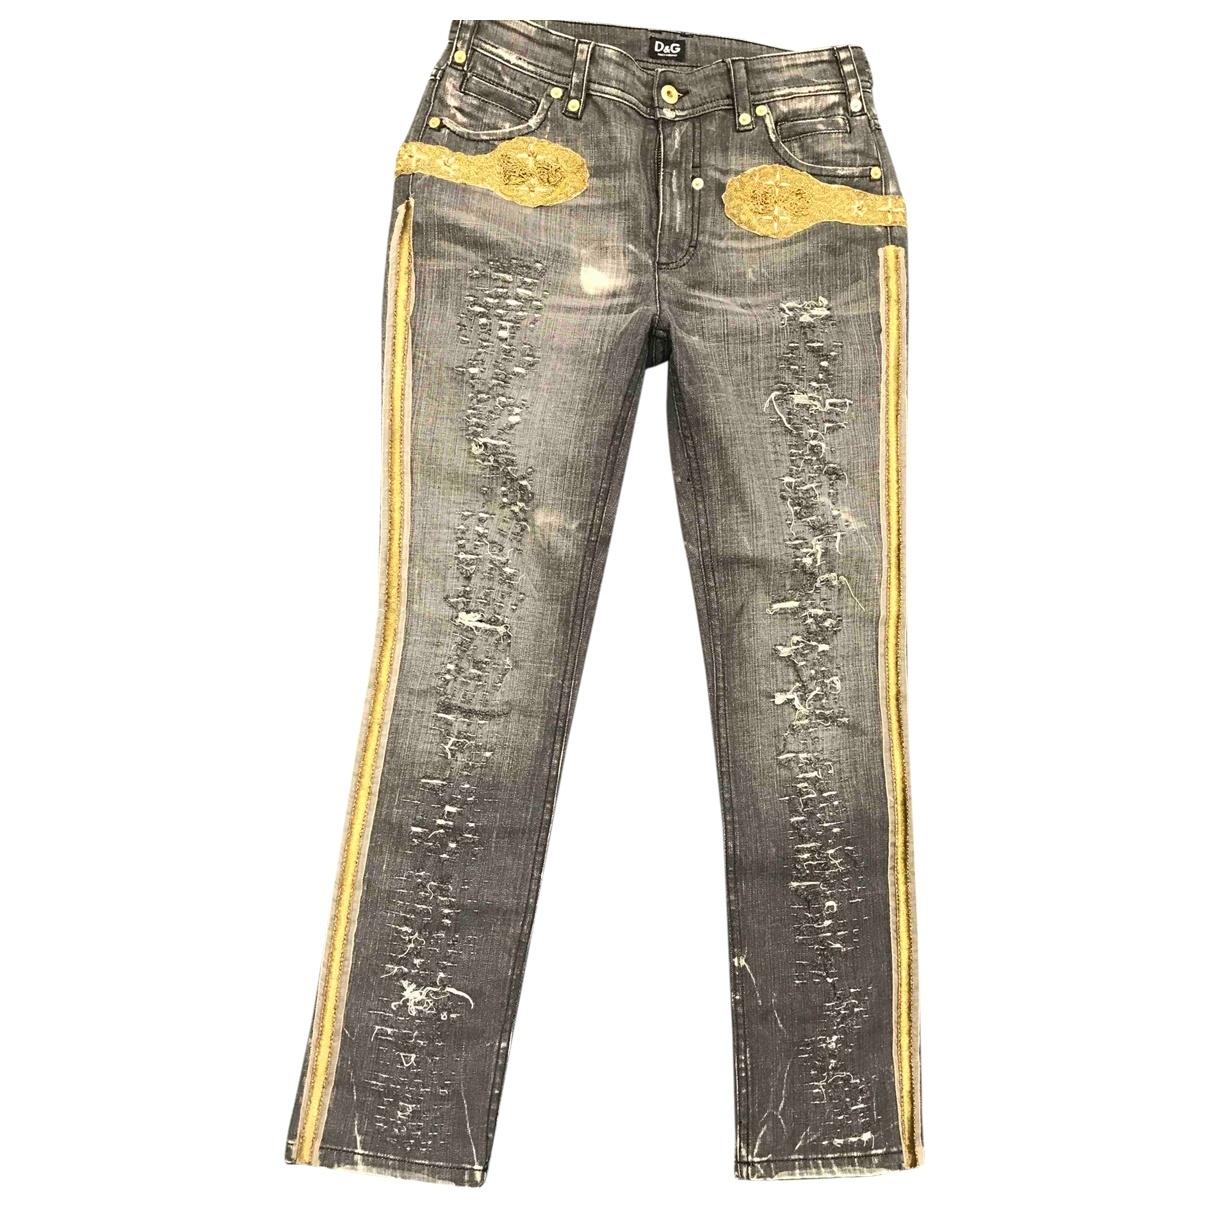 D&g \N Grey Denim - Jeans Jeans for Women 28 US